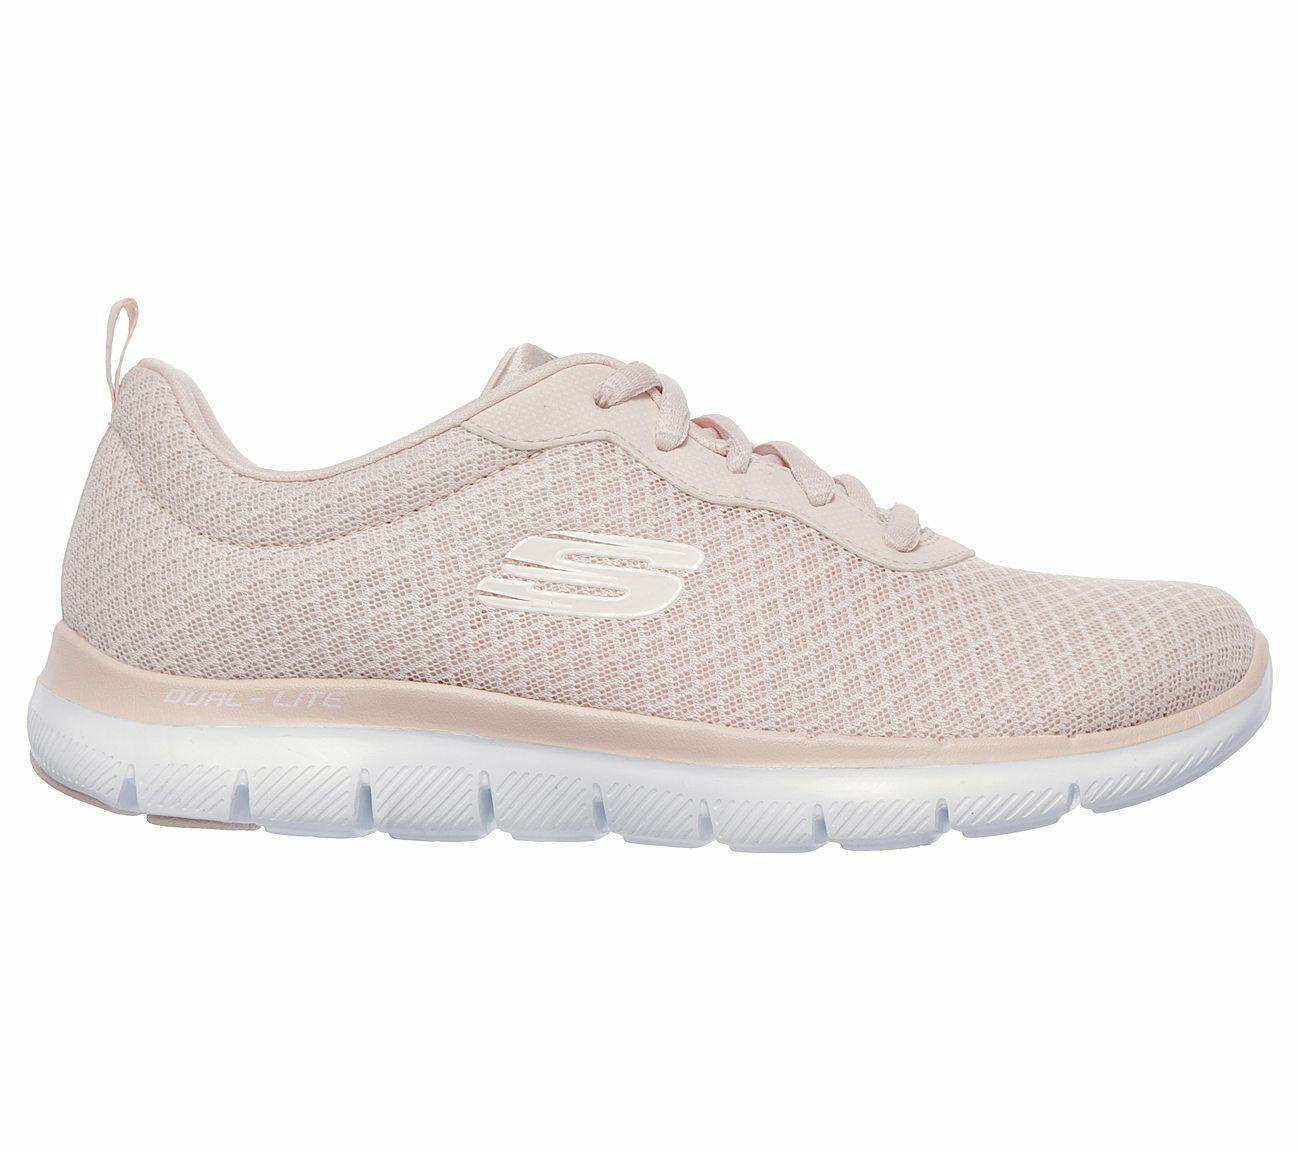 12775 Light Pink Skechers shoe Women Memory Foam Sport Train Comfort Casual Mesh